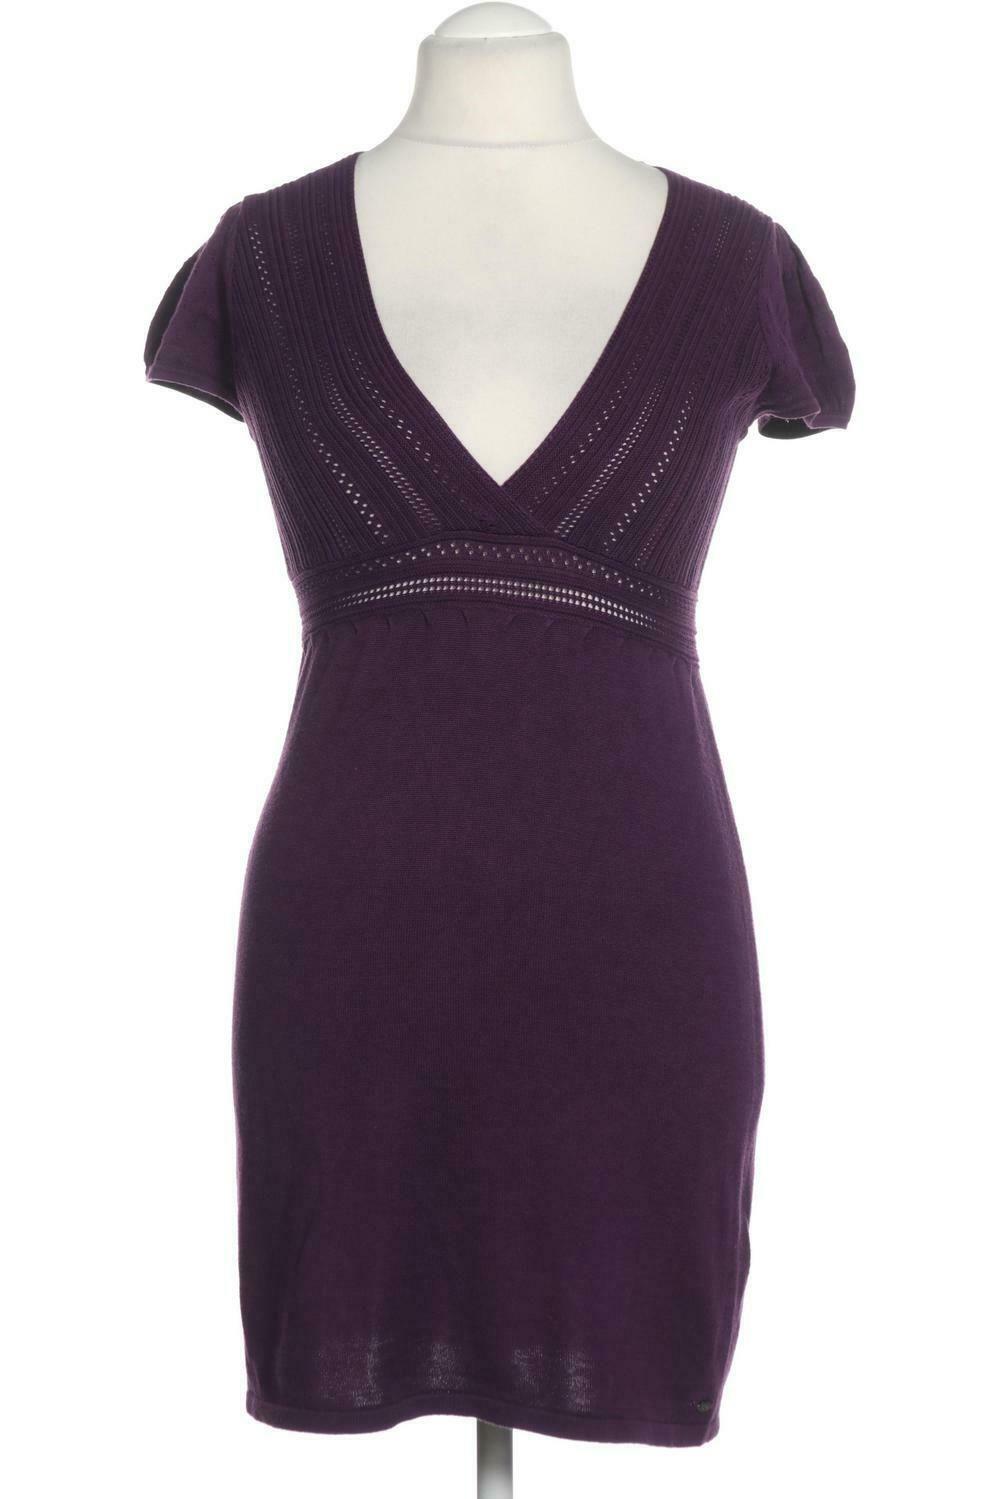 s.oliver kleid damen dress damenkleid gr. de 34 baumwolle